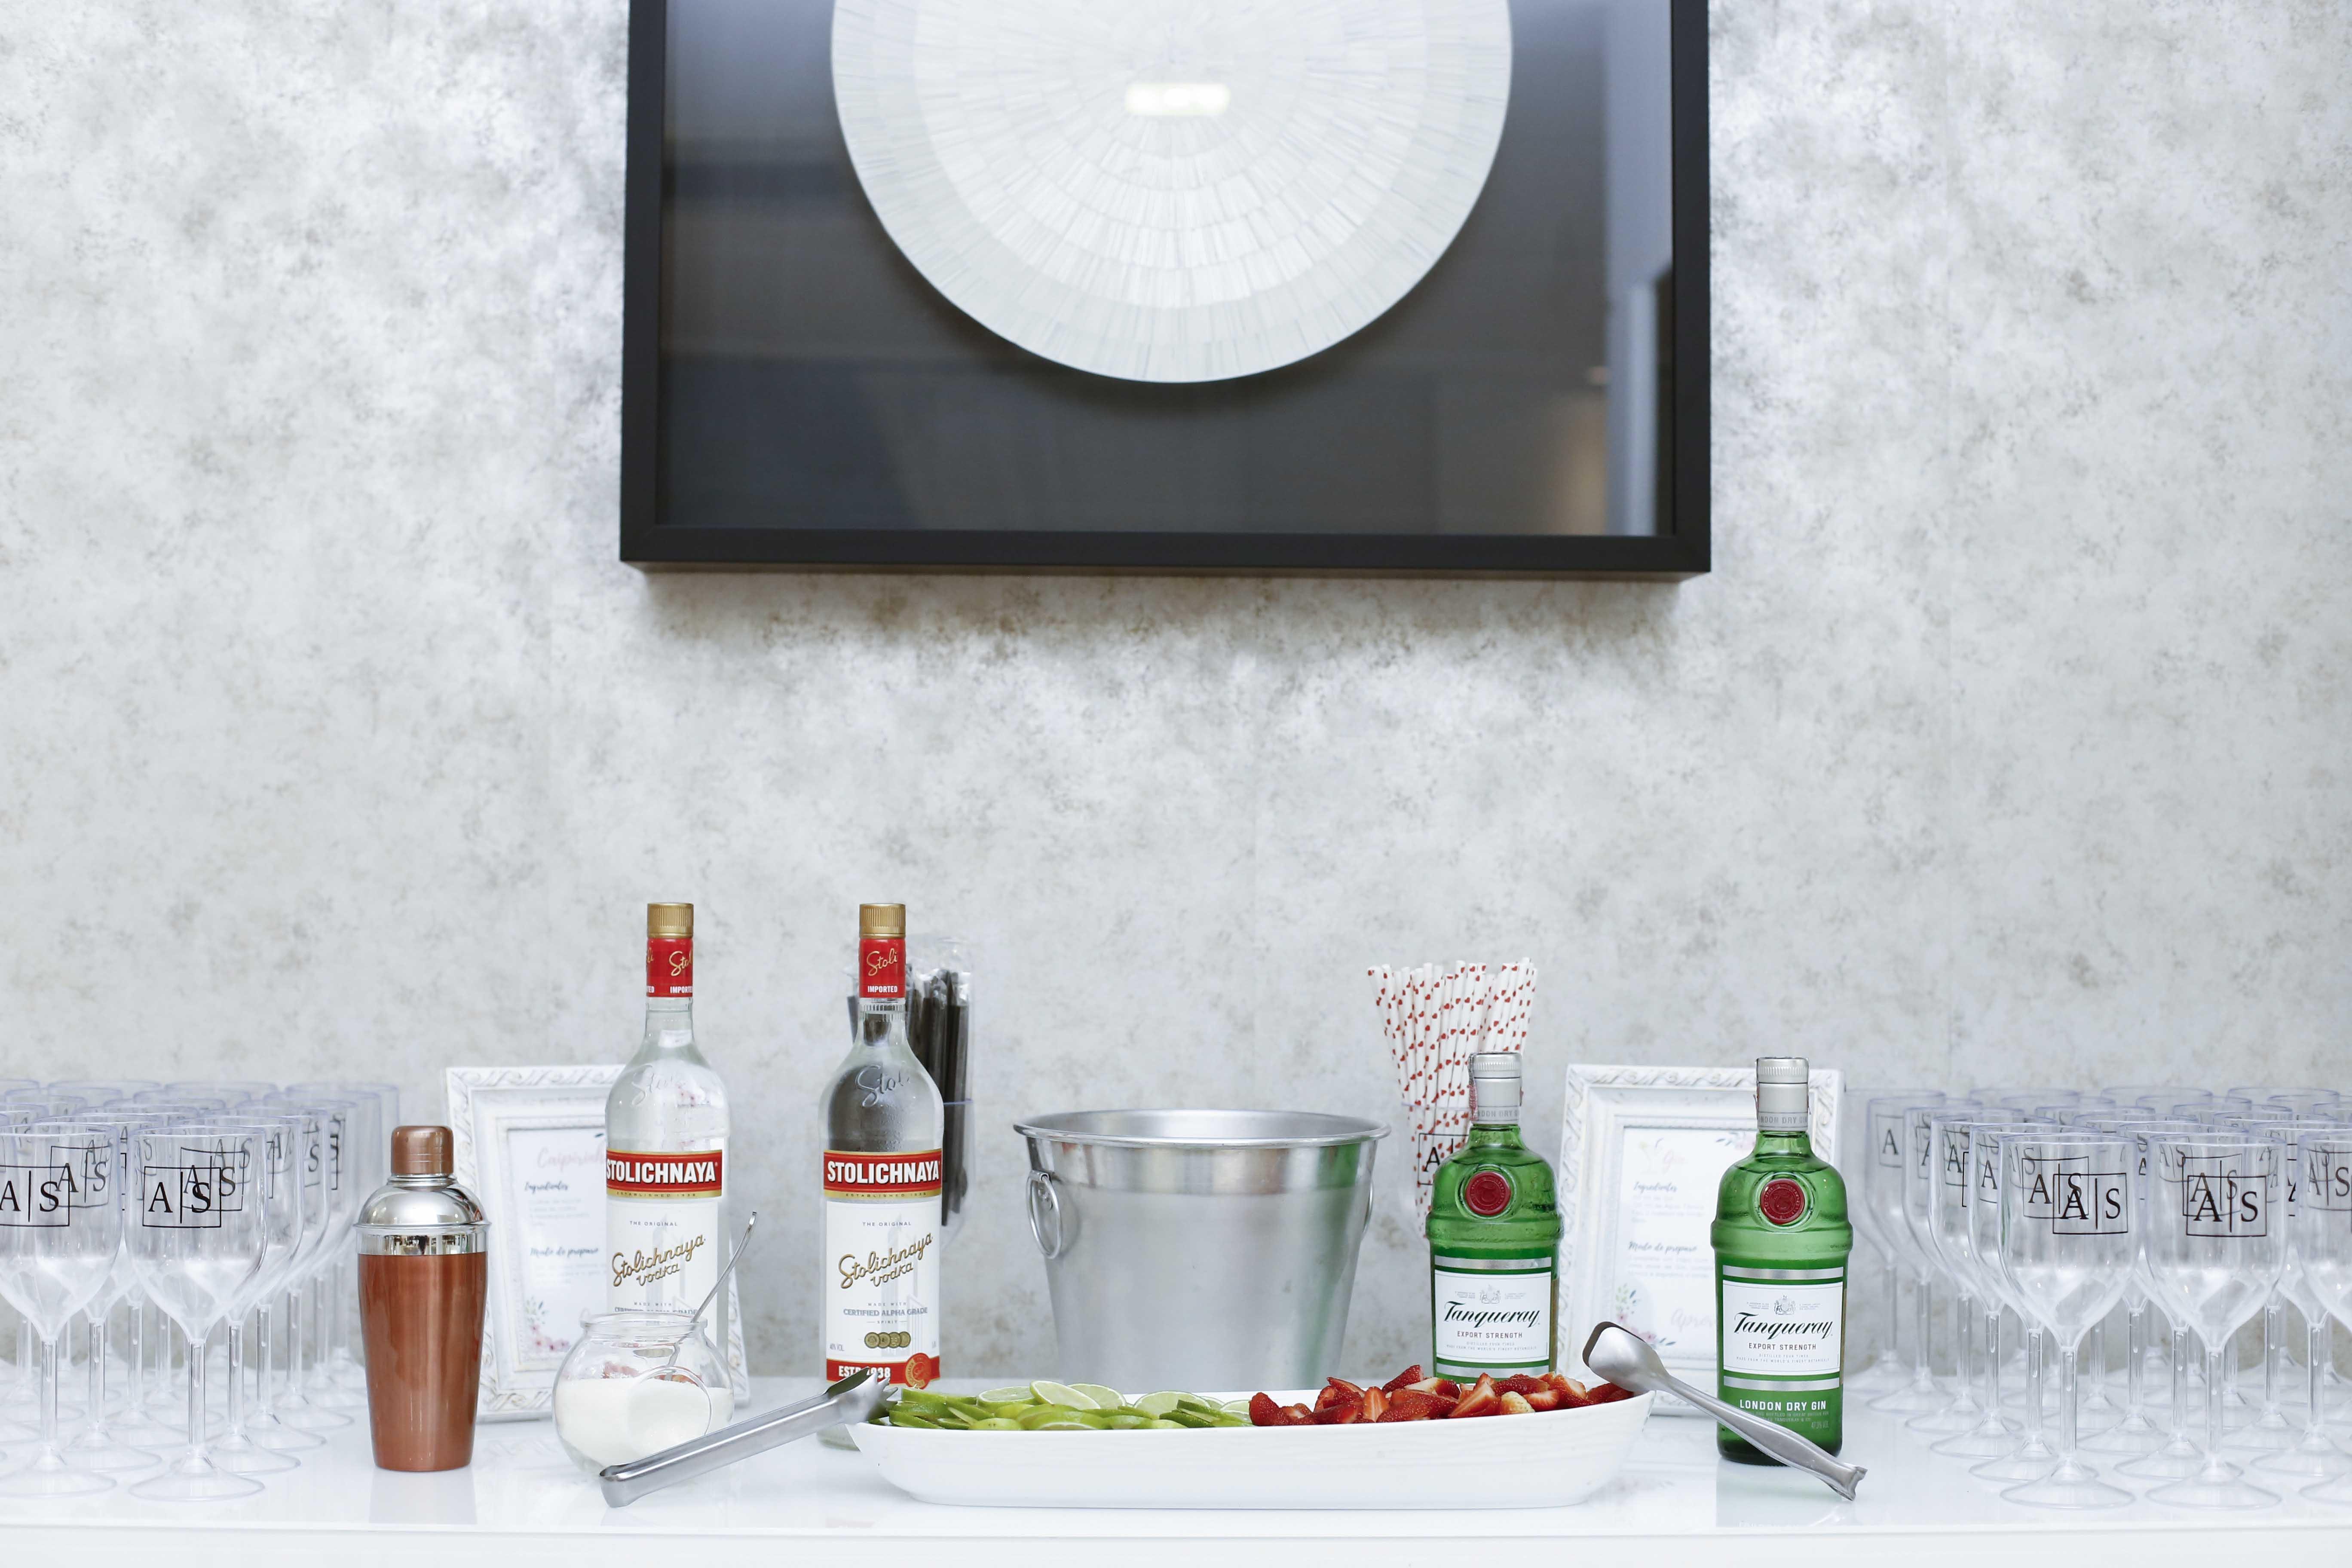 Gratis arkivbilde med alkoholholdige drikkevarer, drinker, flasker, vinglass